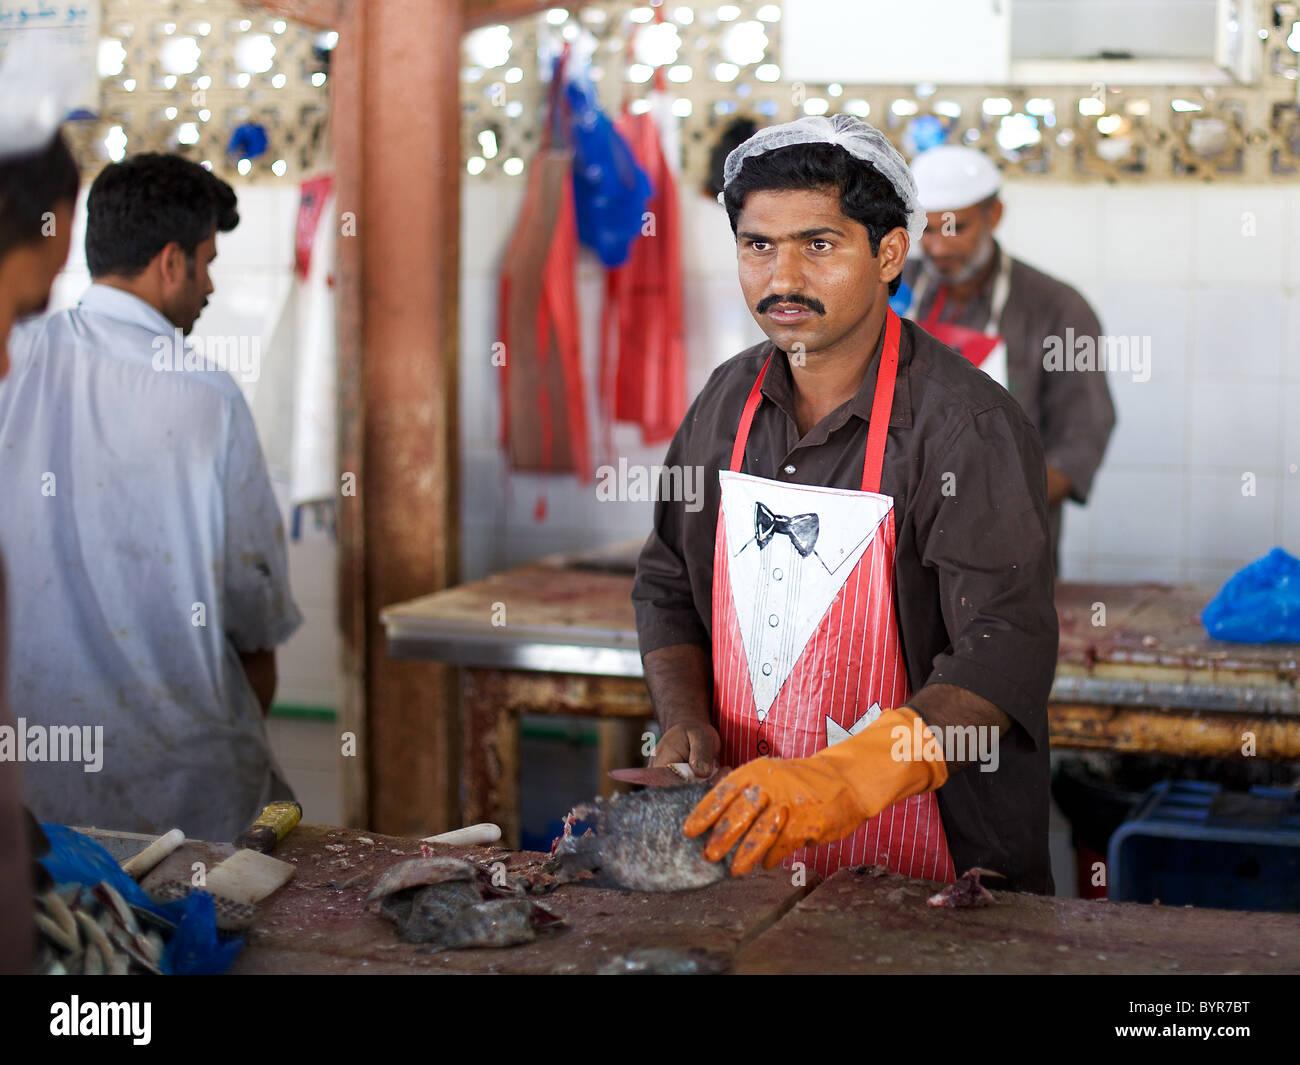 Cleaning fish at Sharjah fish market, Dubai, UAE Stock Photo